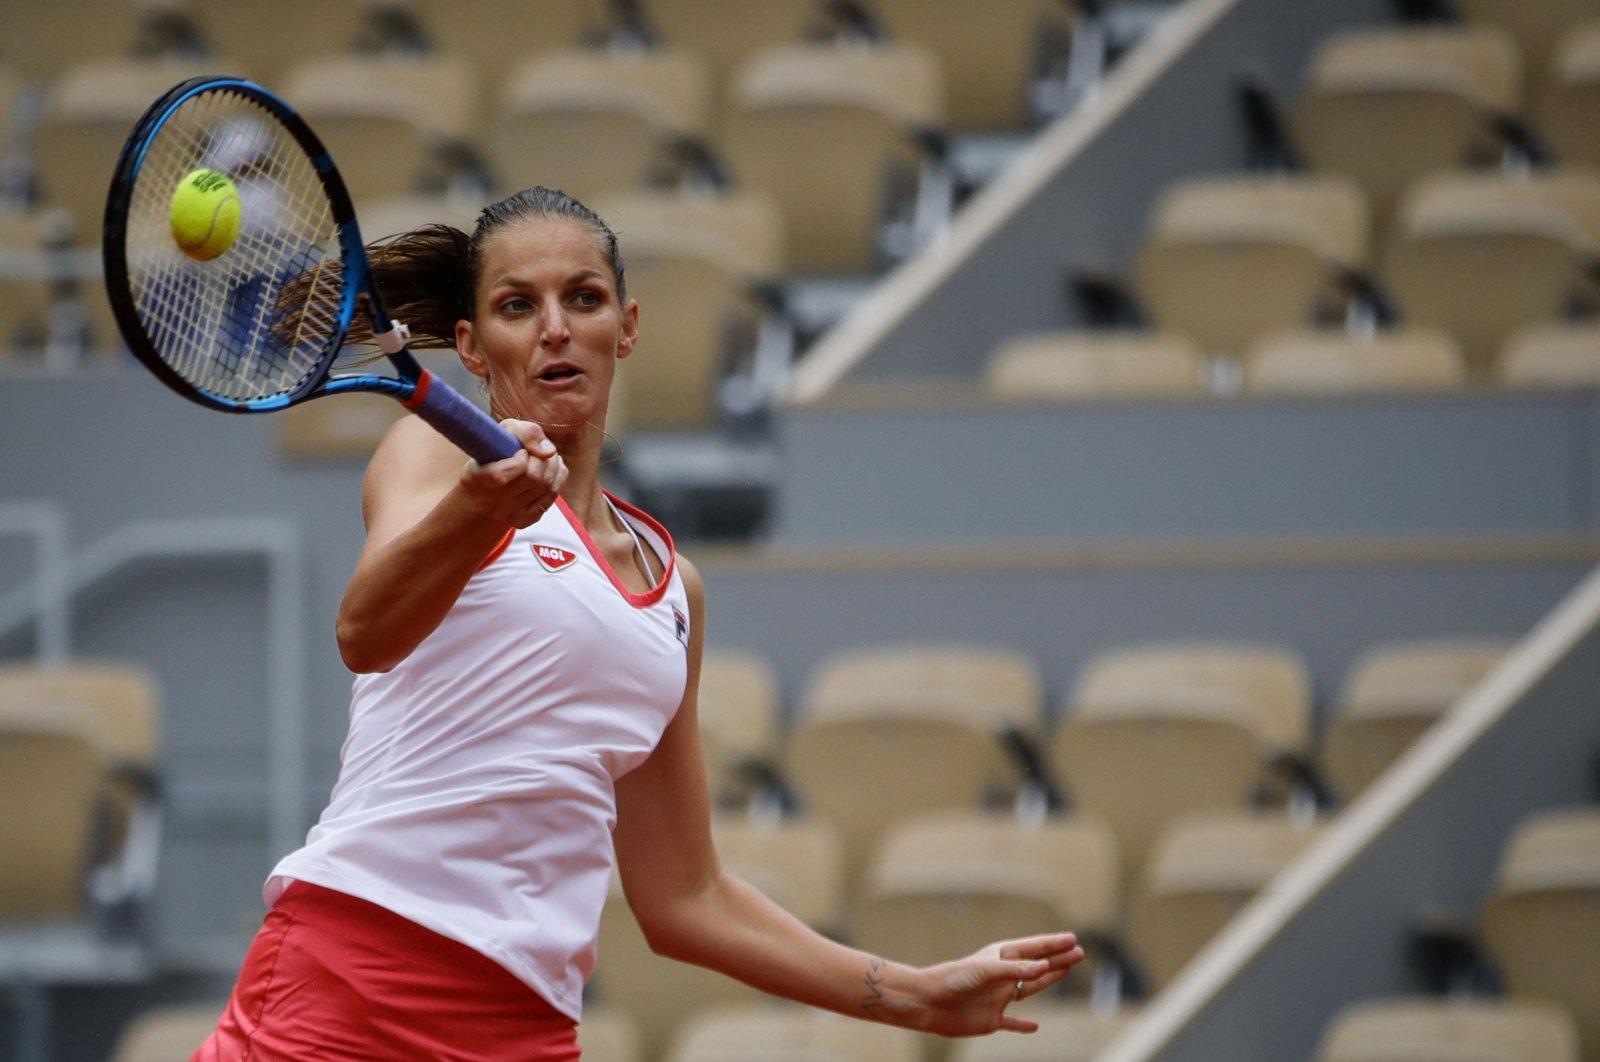 Karolina Pliskova returns the ball to Mayar Sherif during their French Open first round match, in Paris, France, Sept. 29, 2020. (AFP Photo)